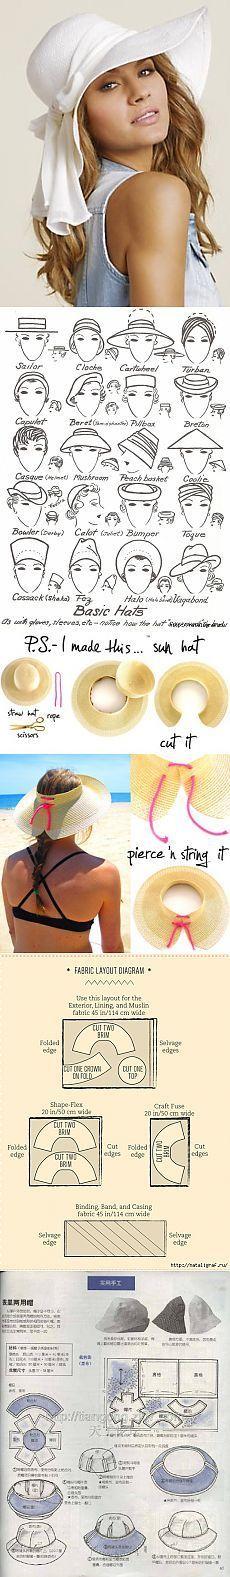 = Kappen, Hüte und Panamahüte =